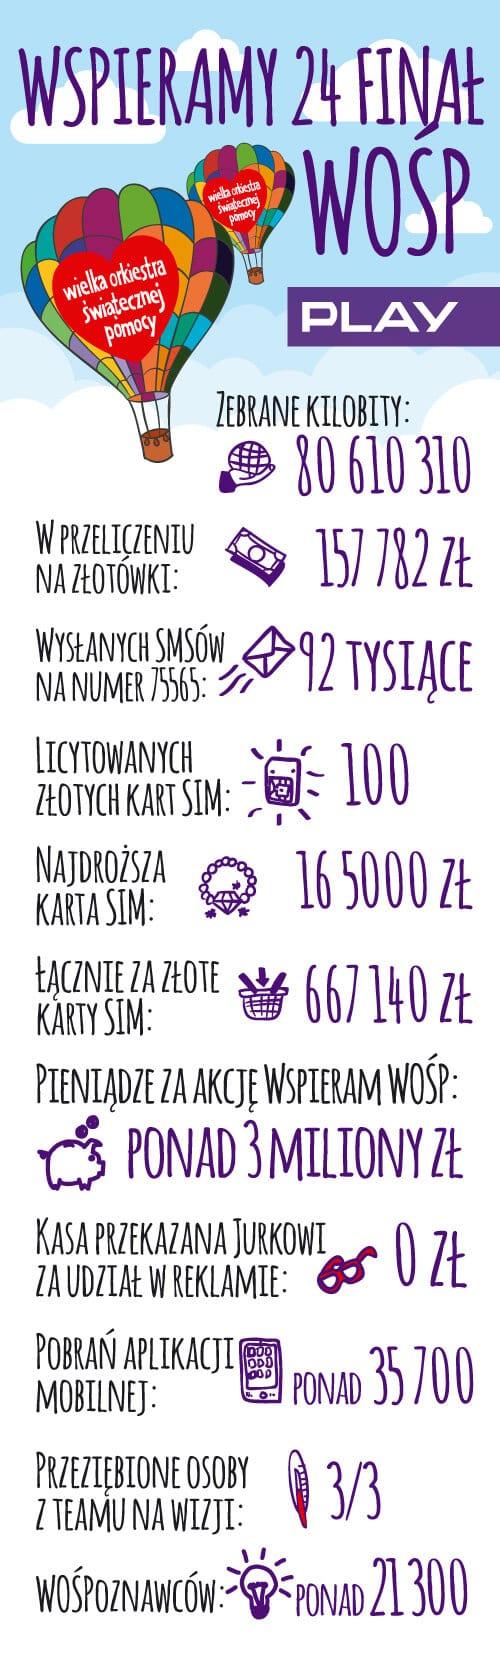 info_wosp